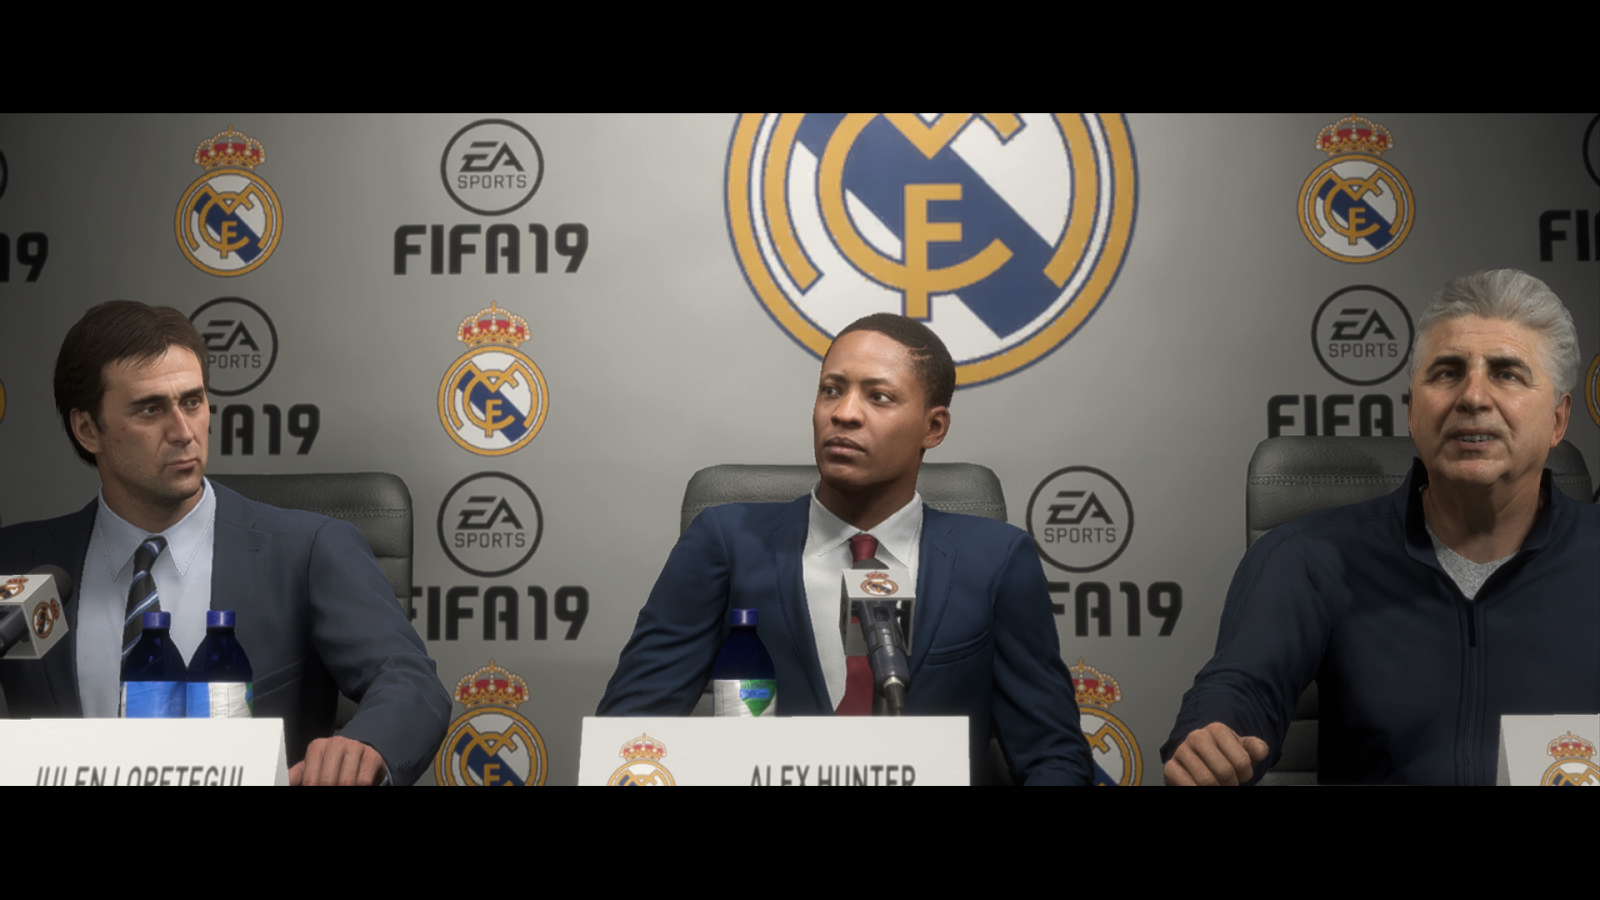 FIFA 19 The Journey: Champions